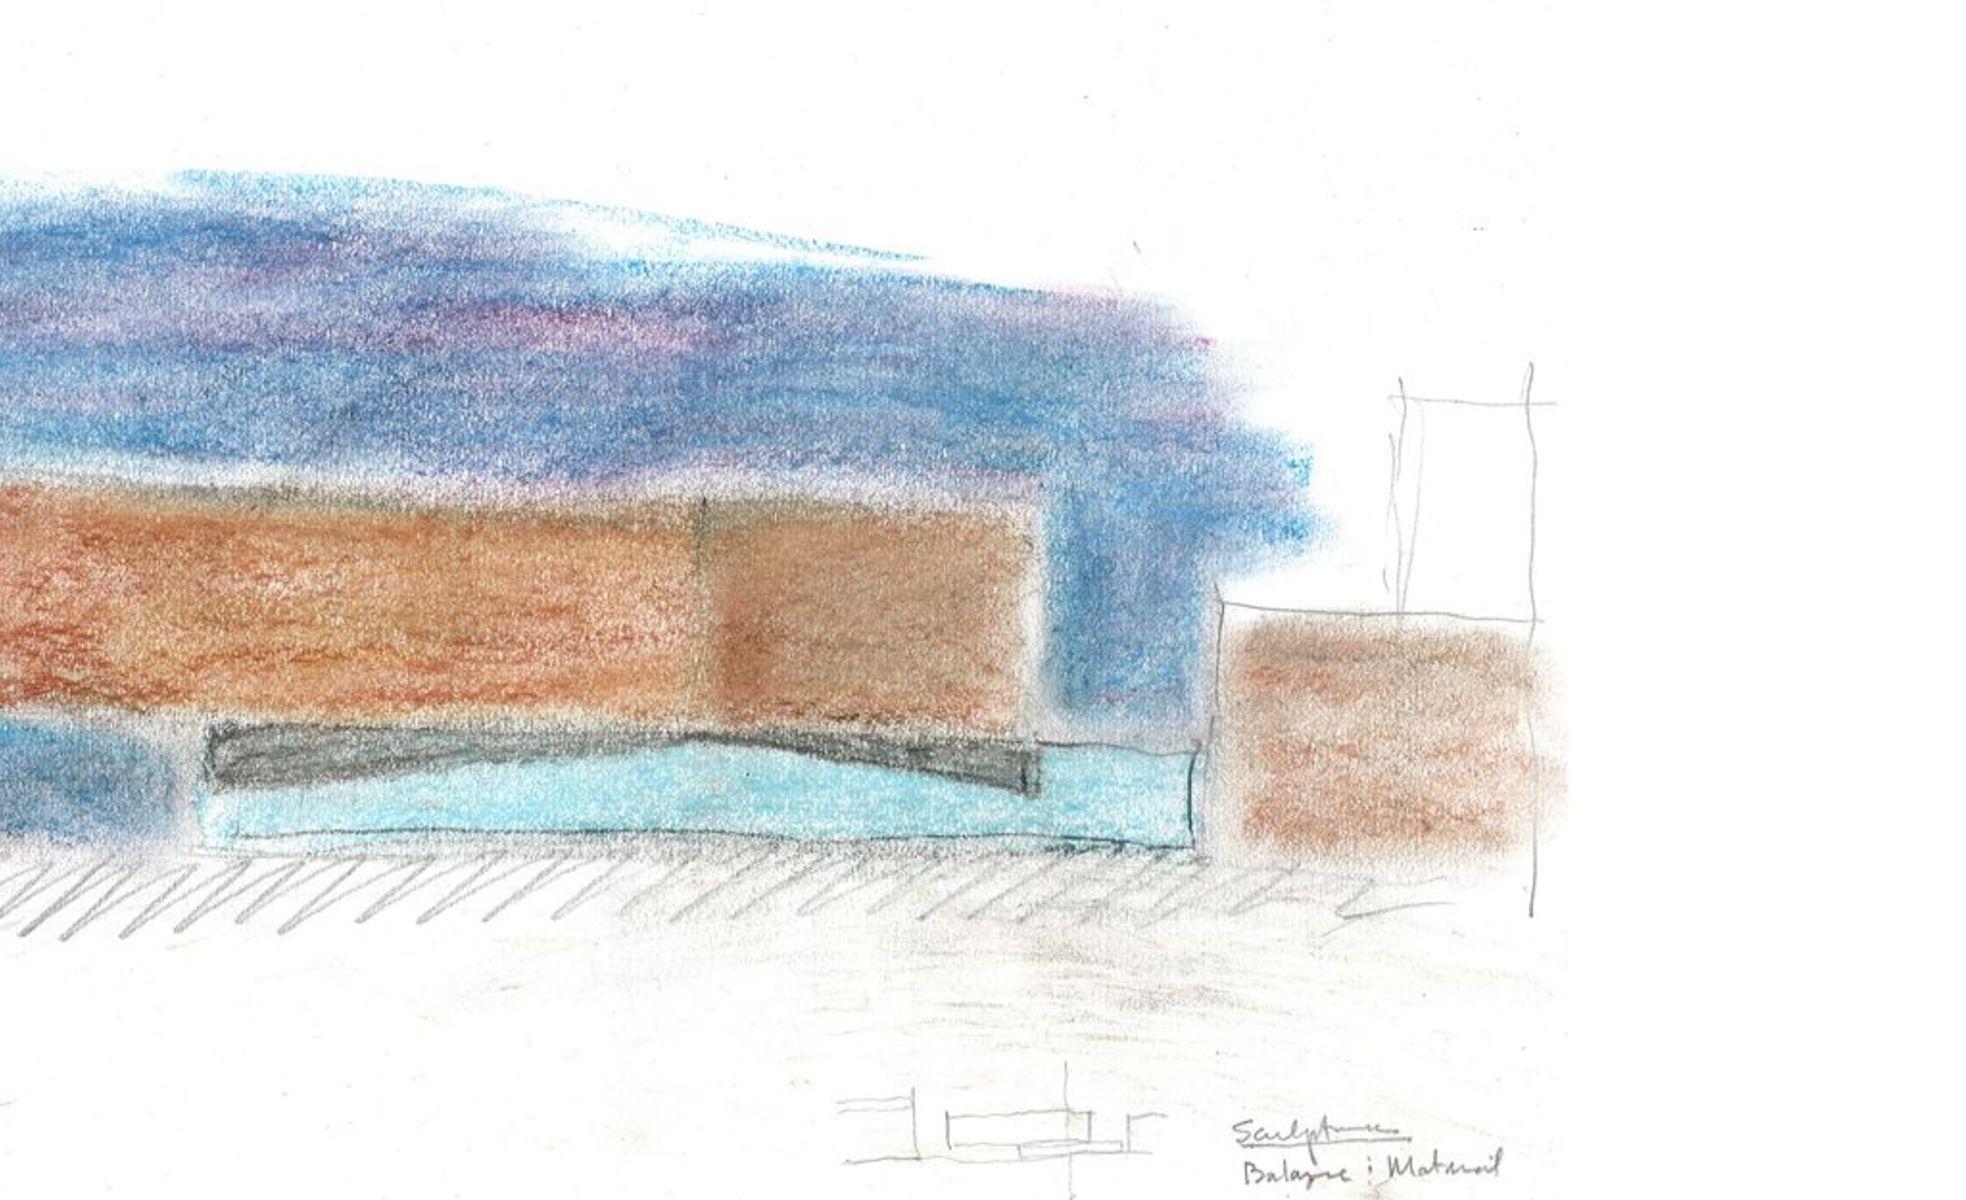 Ikon.5: McGee Art Pavilion a New York